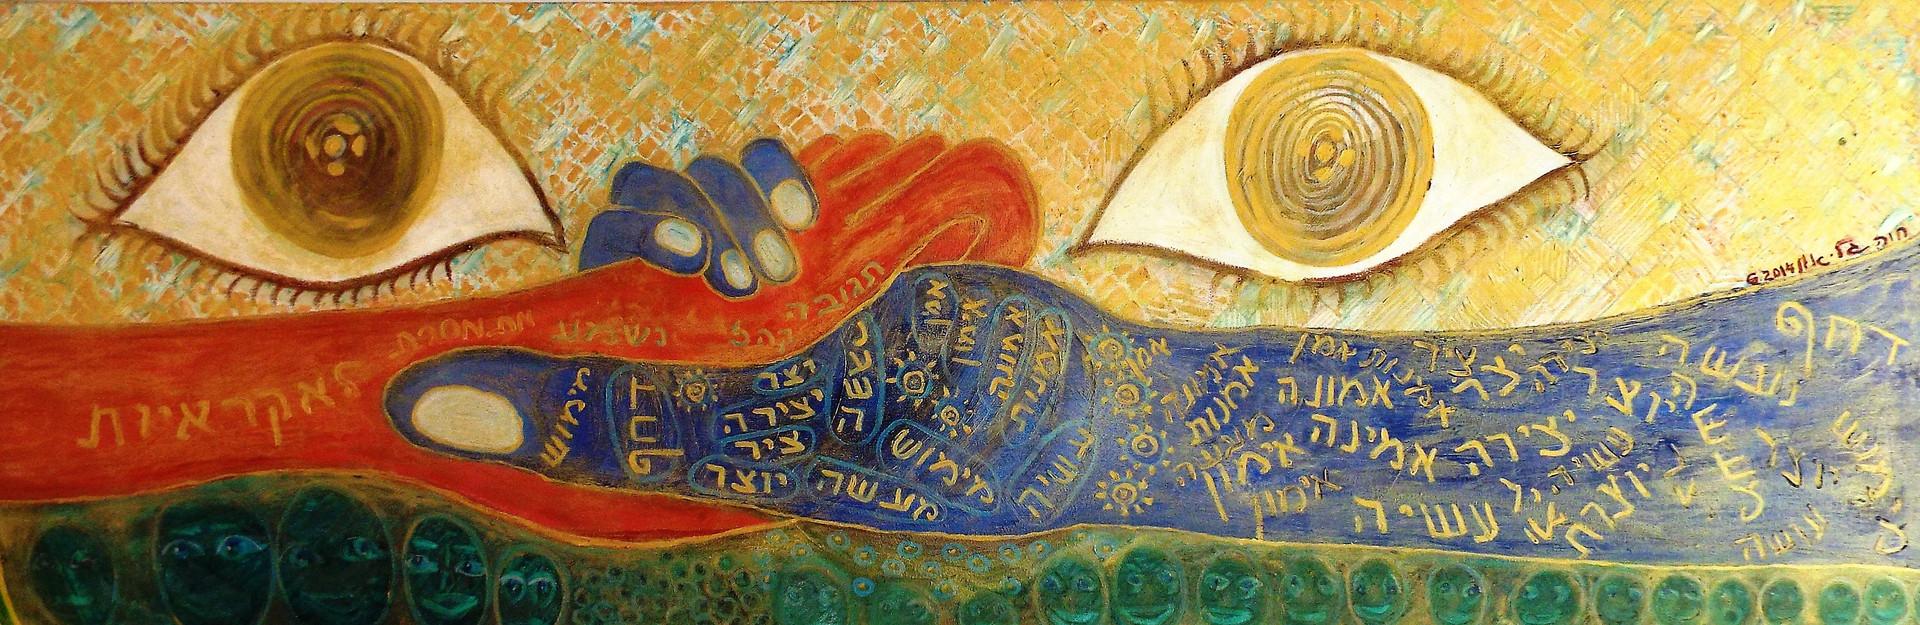 The Artist, 2014, oil on canvas,180x70